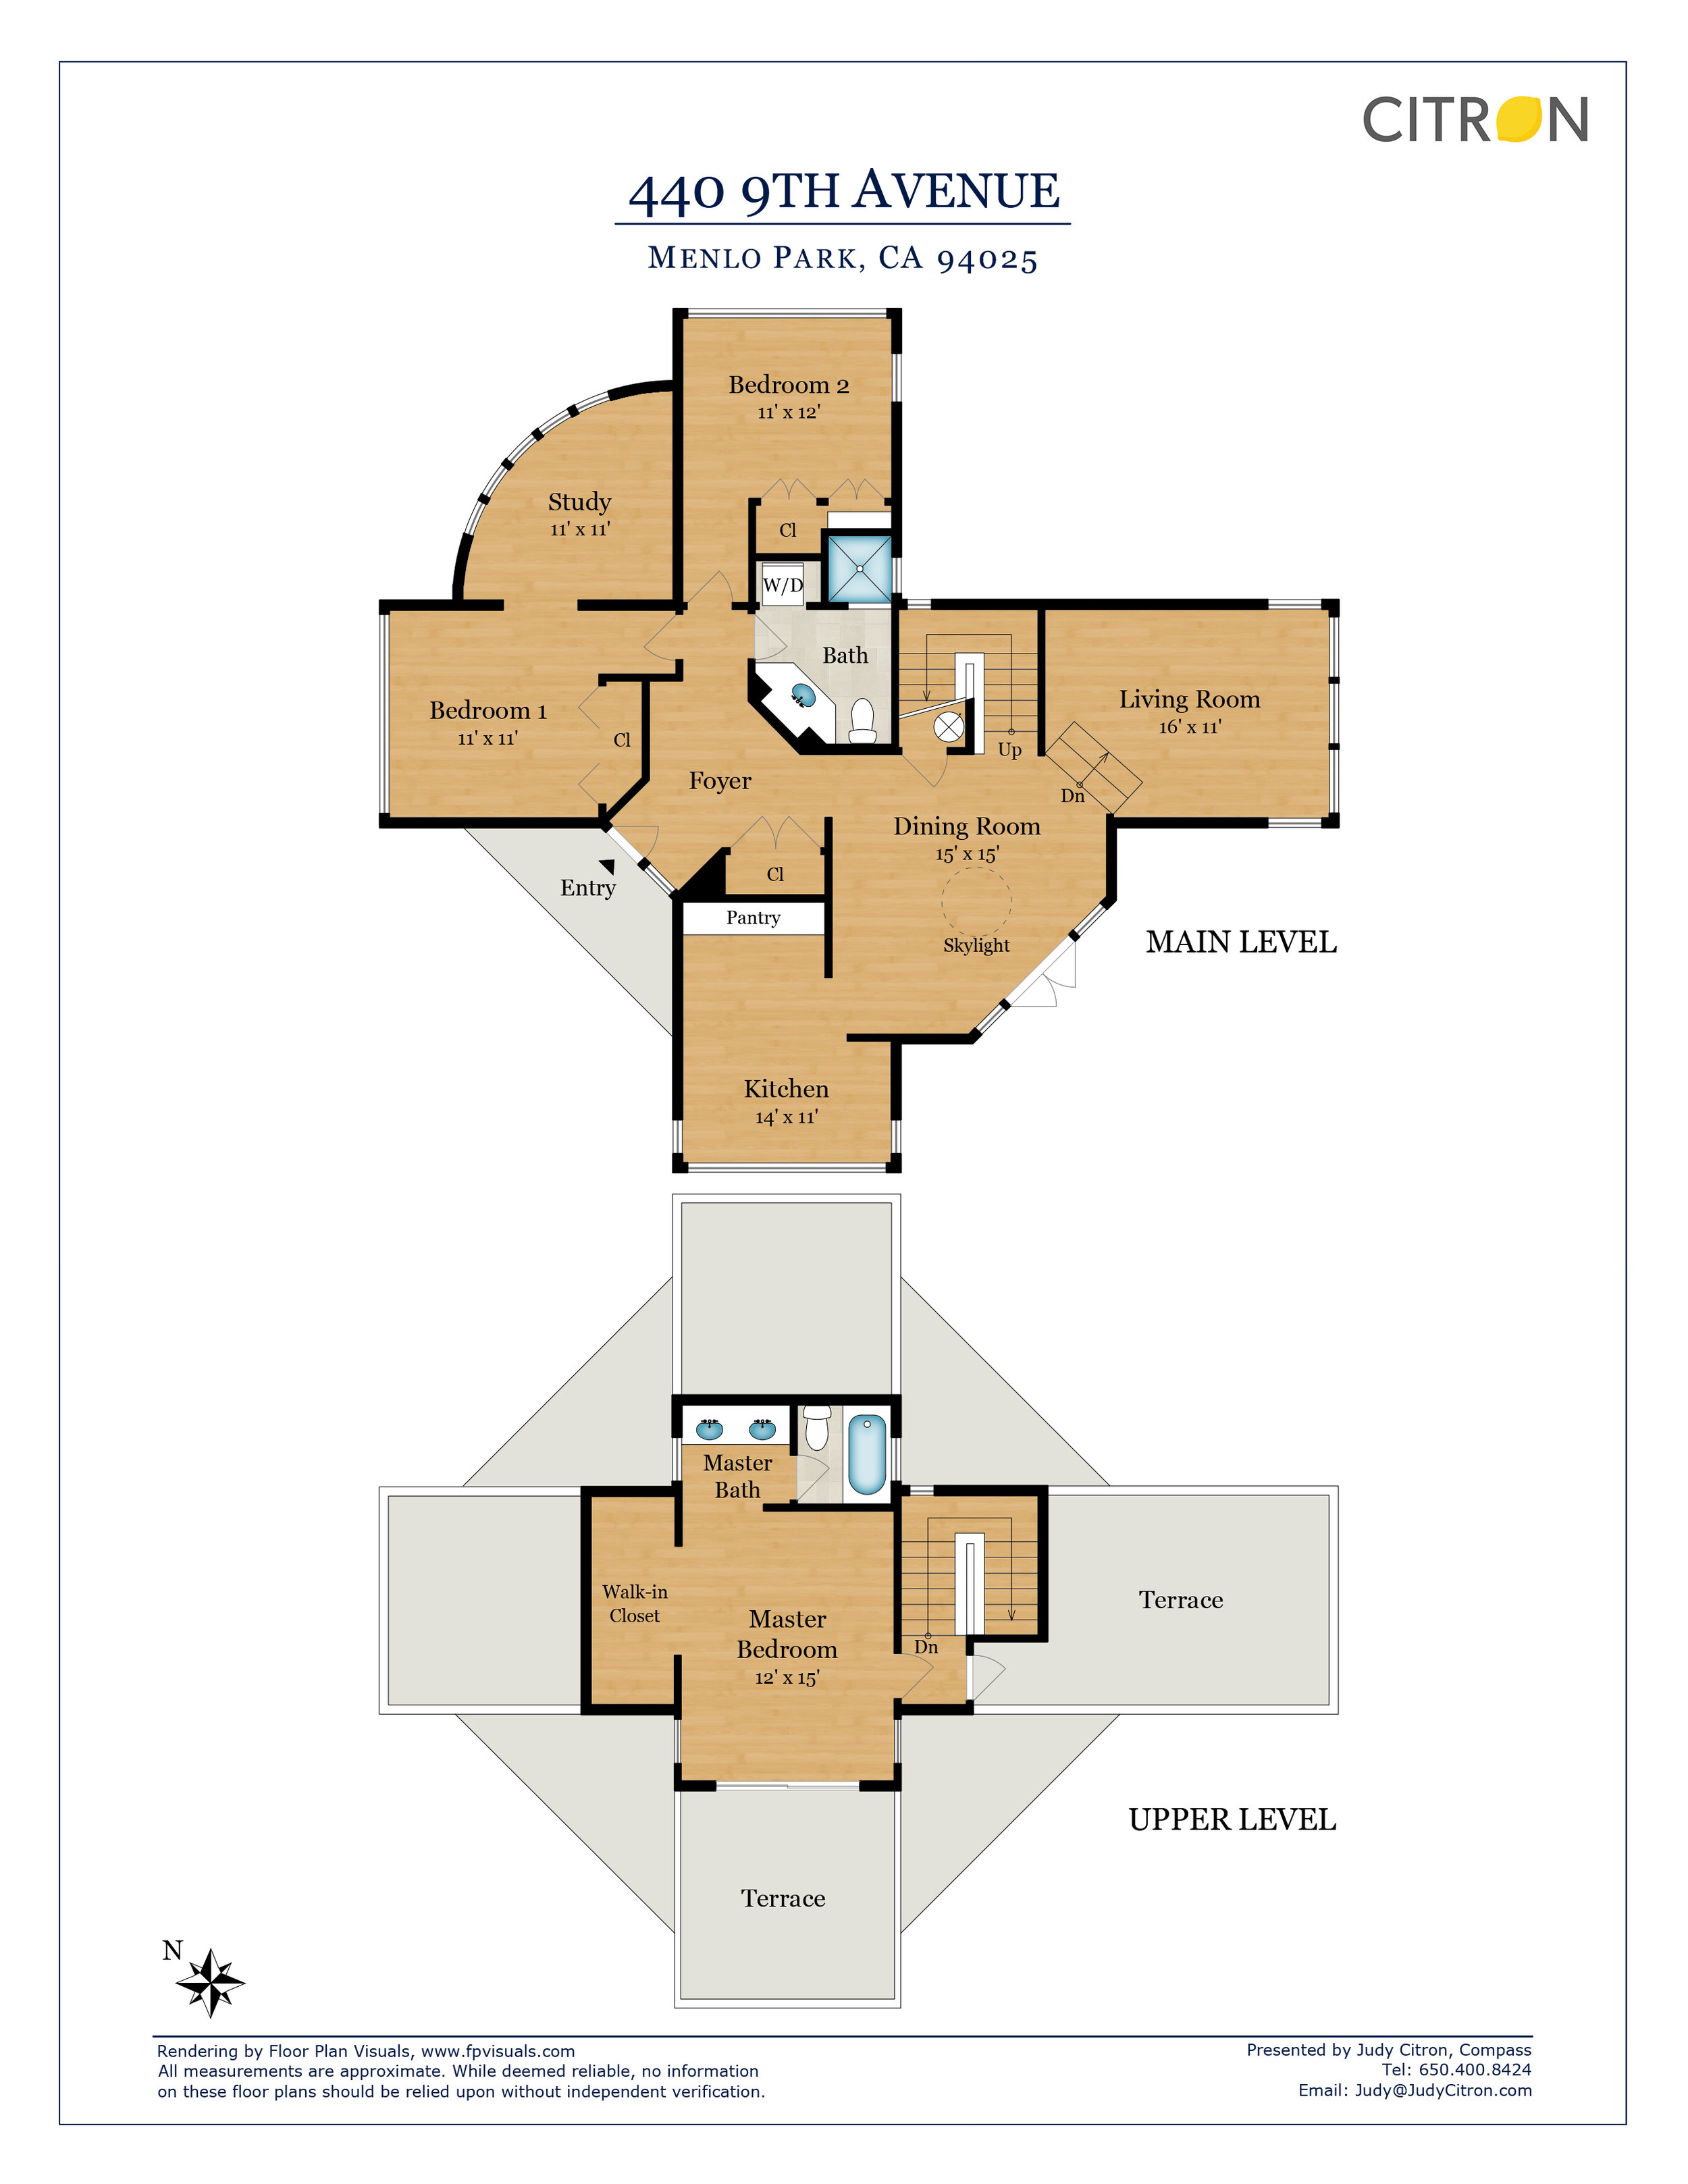 JC-440_9thAve-FloorPlan-Print-R2.jpg